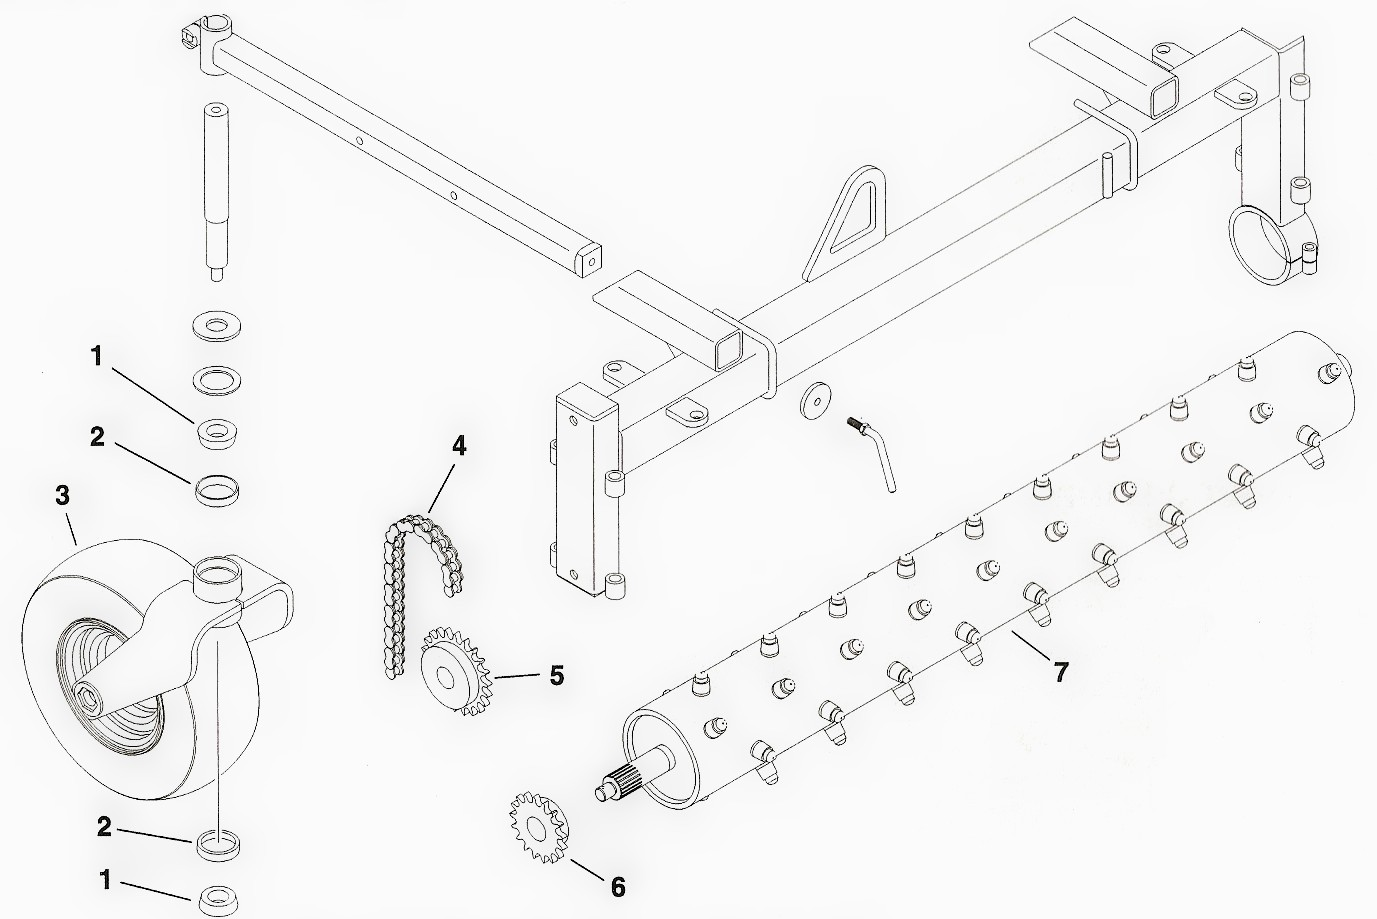 Toro Dingo Cultivator and Harley Rake Attachment Parts Diagram